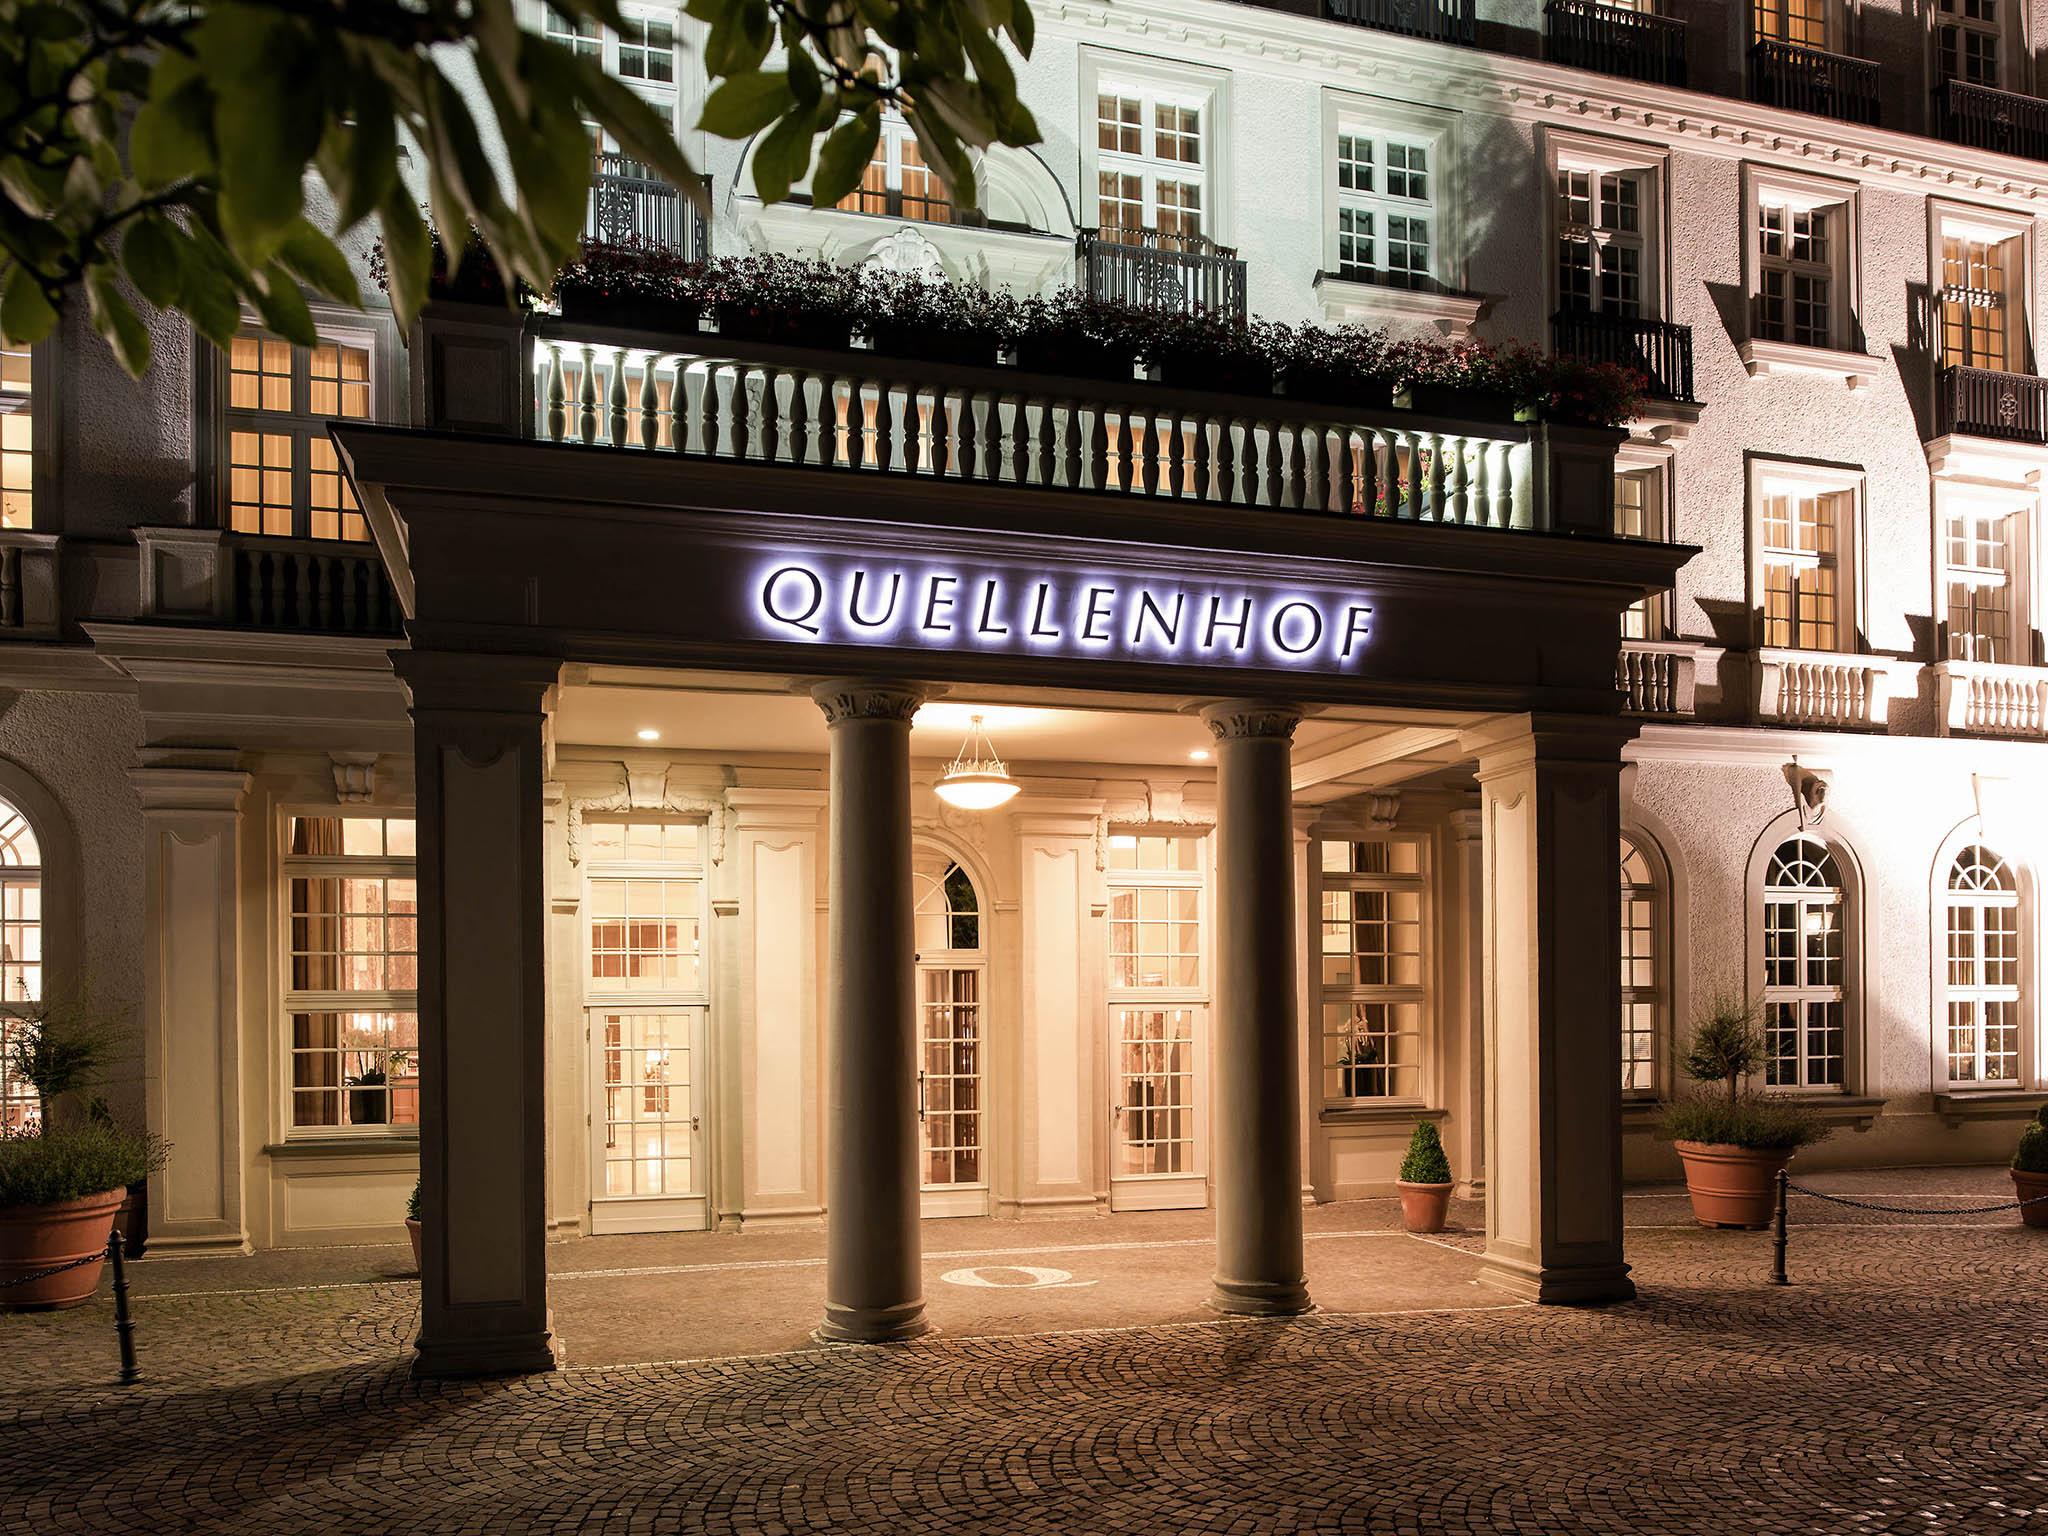 فندق - Pullman Aachen Quellenhof